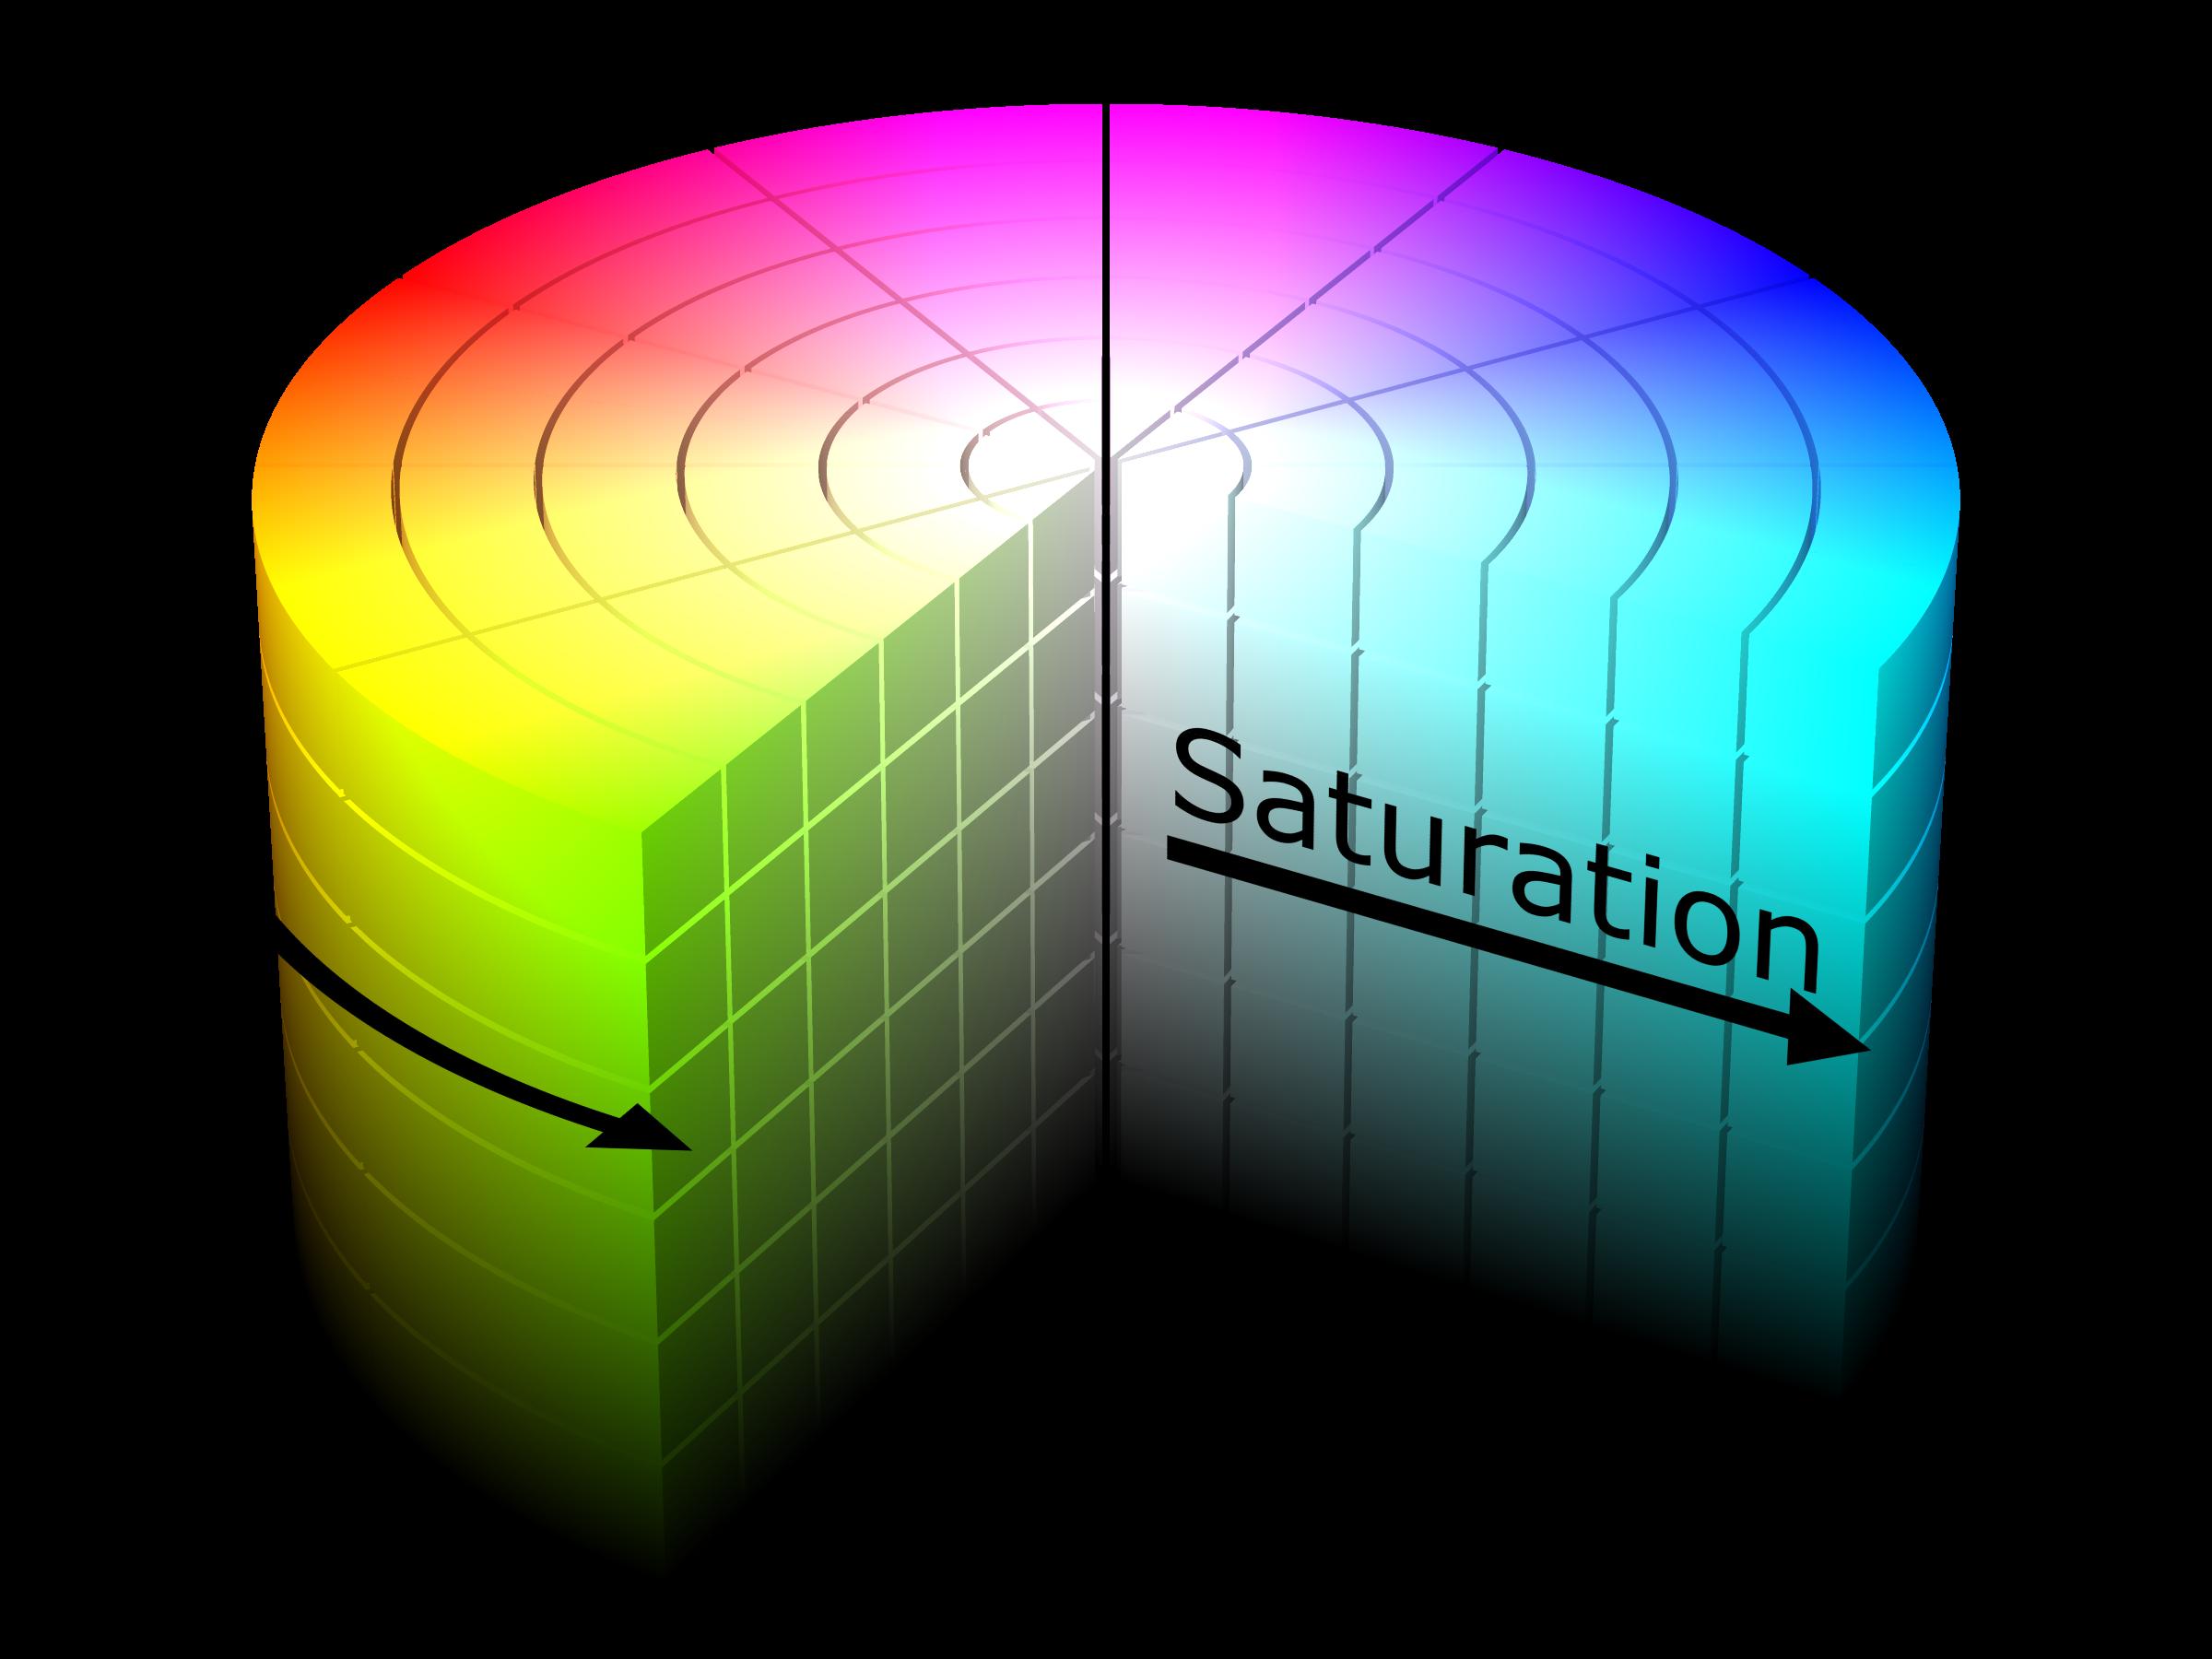 Fig 5.3 HSV color space